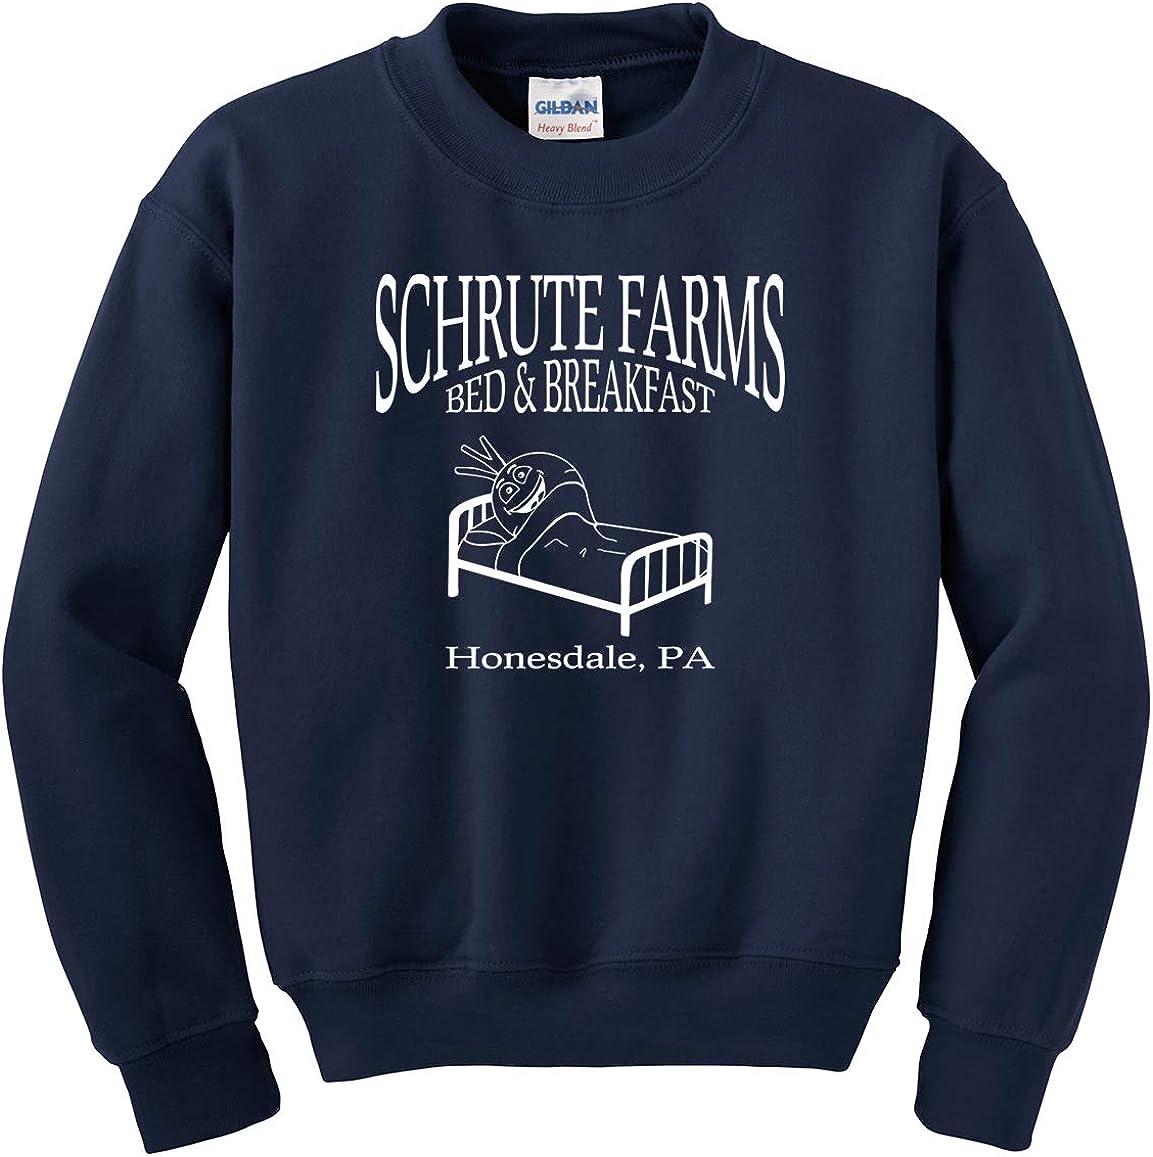 Beetwine Essentials Schrute Farms Bed & Breakfast Sweatshirt Hoodie Unisex